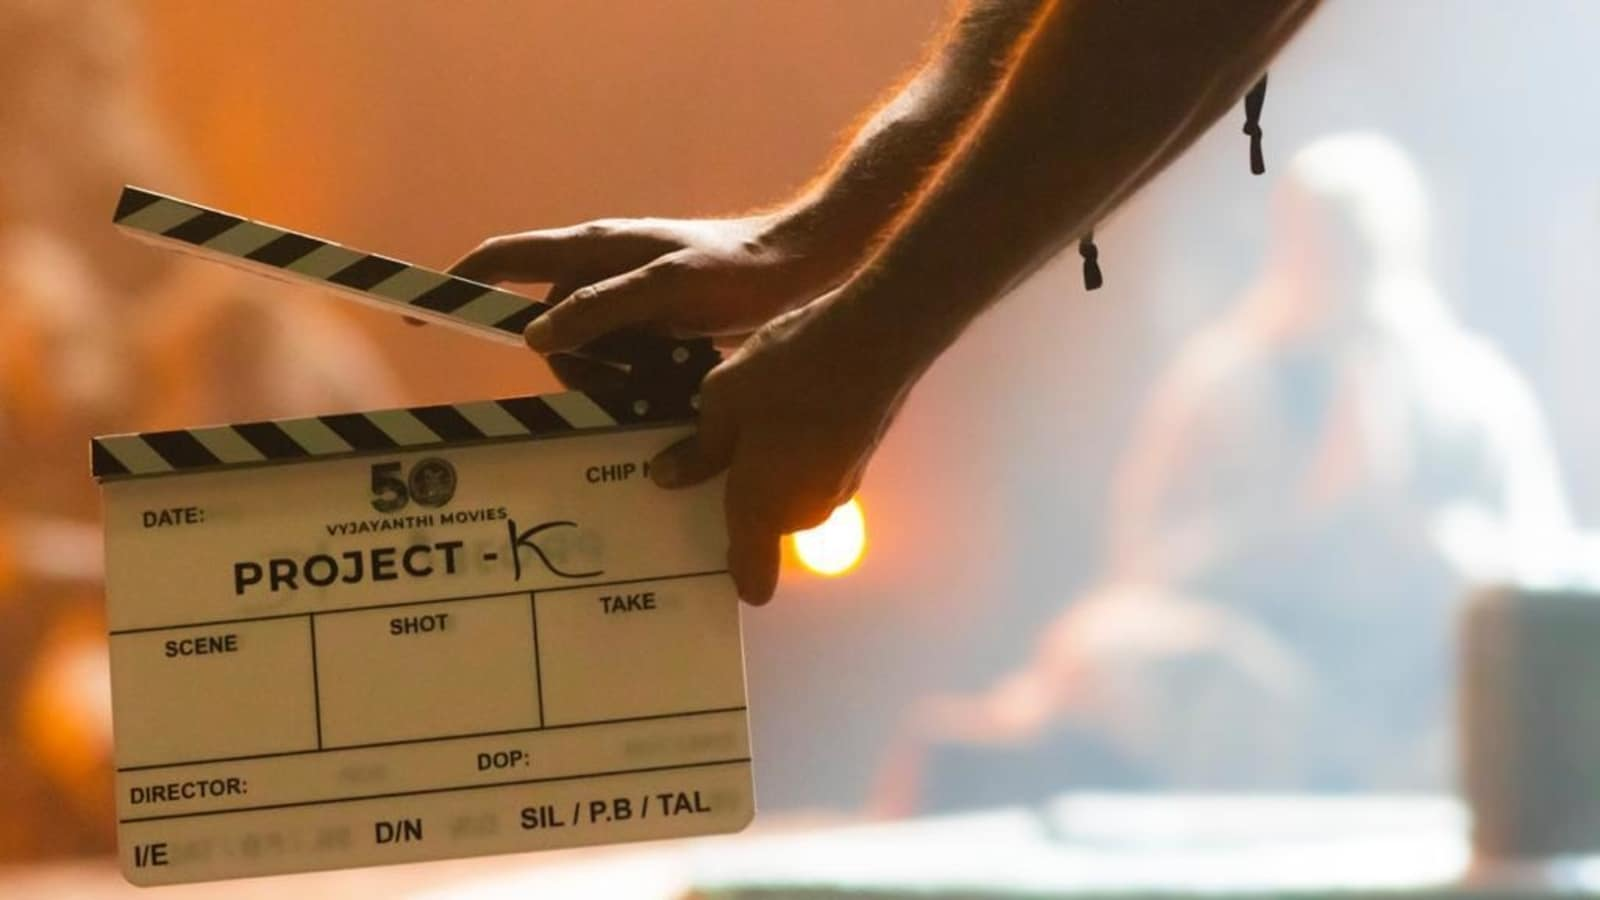 Amitabh Bachchan-Deepika Padukone's sci-fi thriller with Prabhas goes on  floors in Hyderabad: 'What an honour' | Bollywood - Hindustan Times